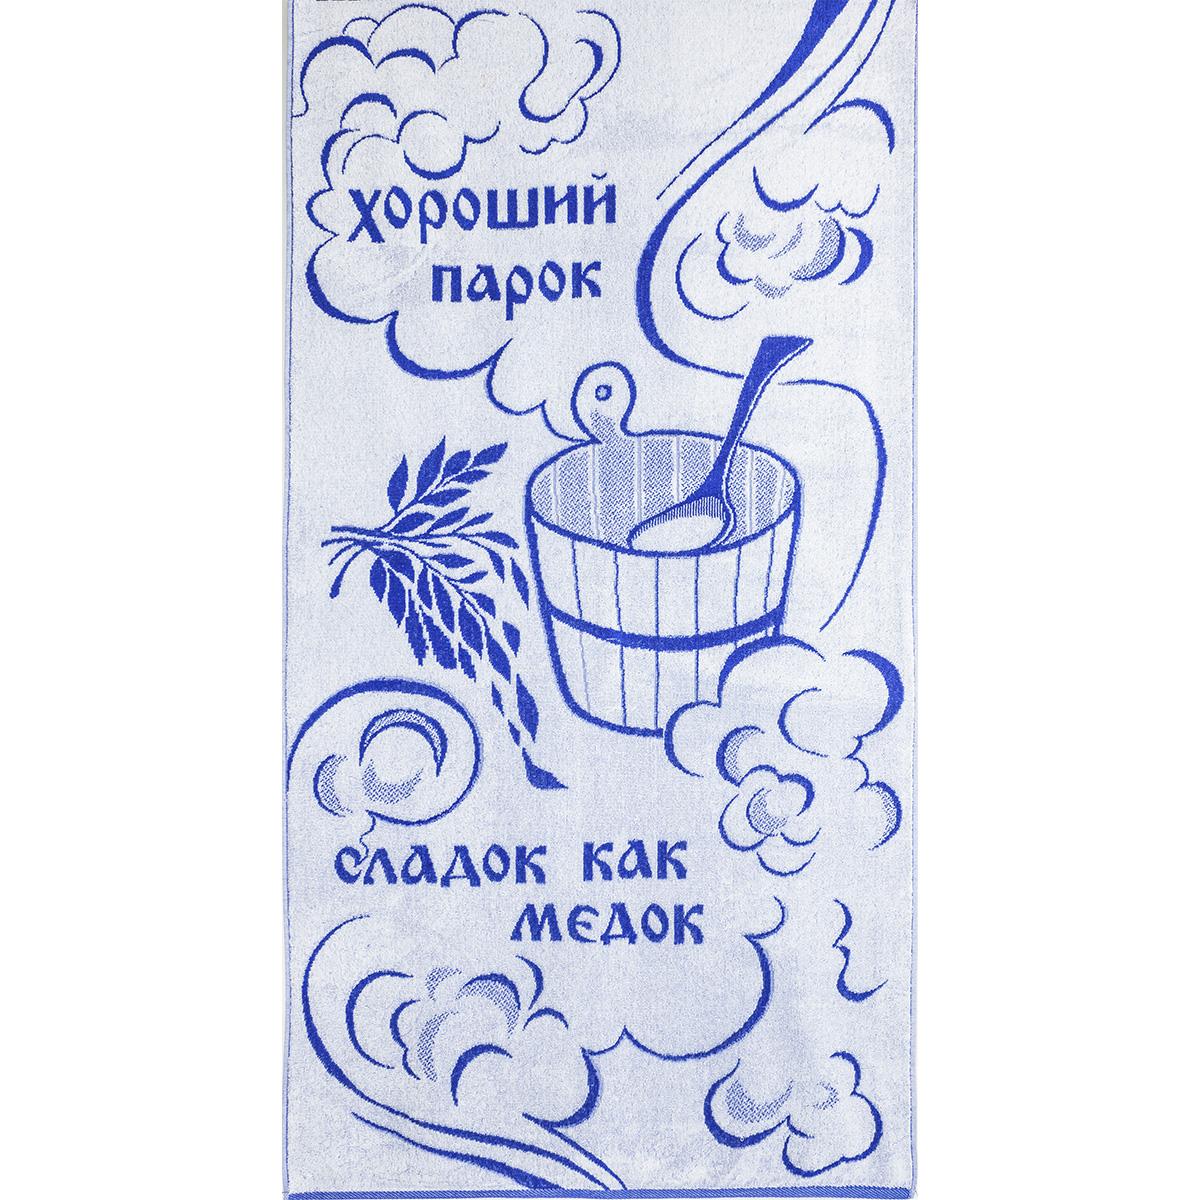 Полотенце Хороший парок, размер 70х140 см.Махровые полотенца<br>Плотность ткани:420 г/кв. м<br><br>Тип: Полотенце<br>Размер: 70х140<br>Материал: Махра